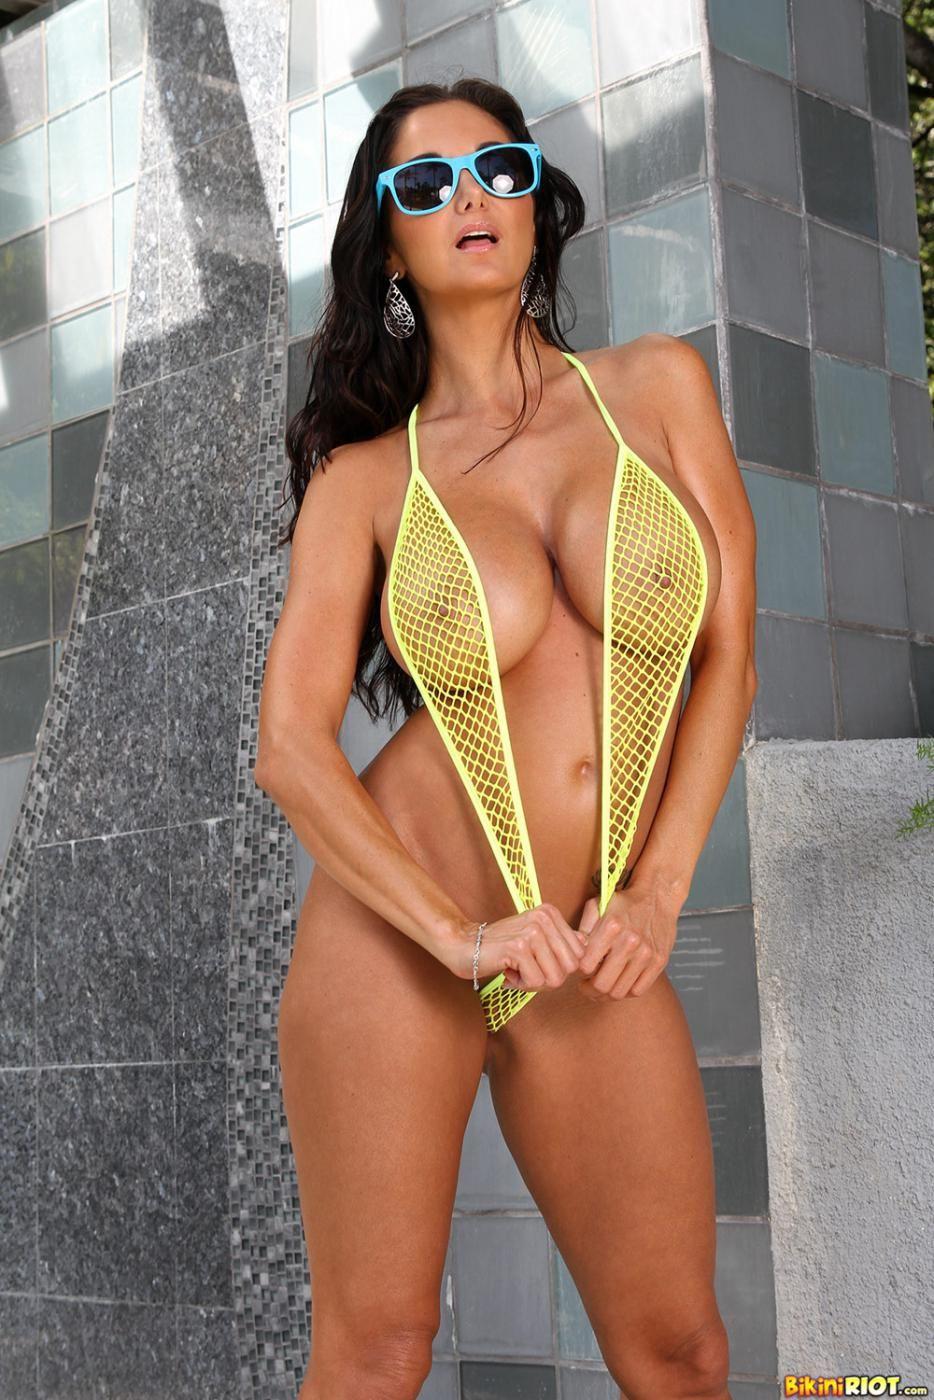 ava addams bikini   bikiny celebrity   pinterest   ava